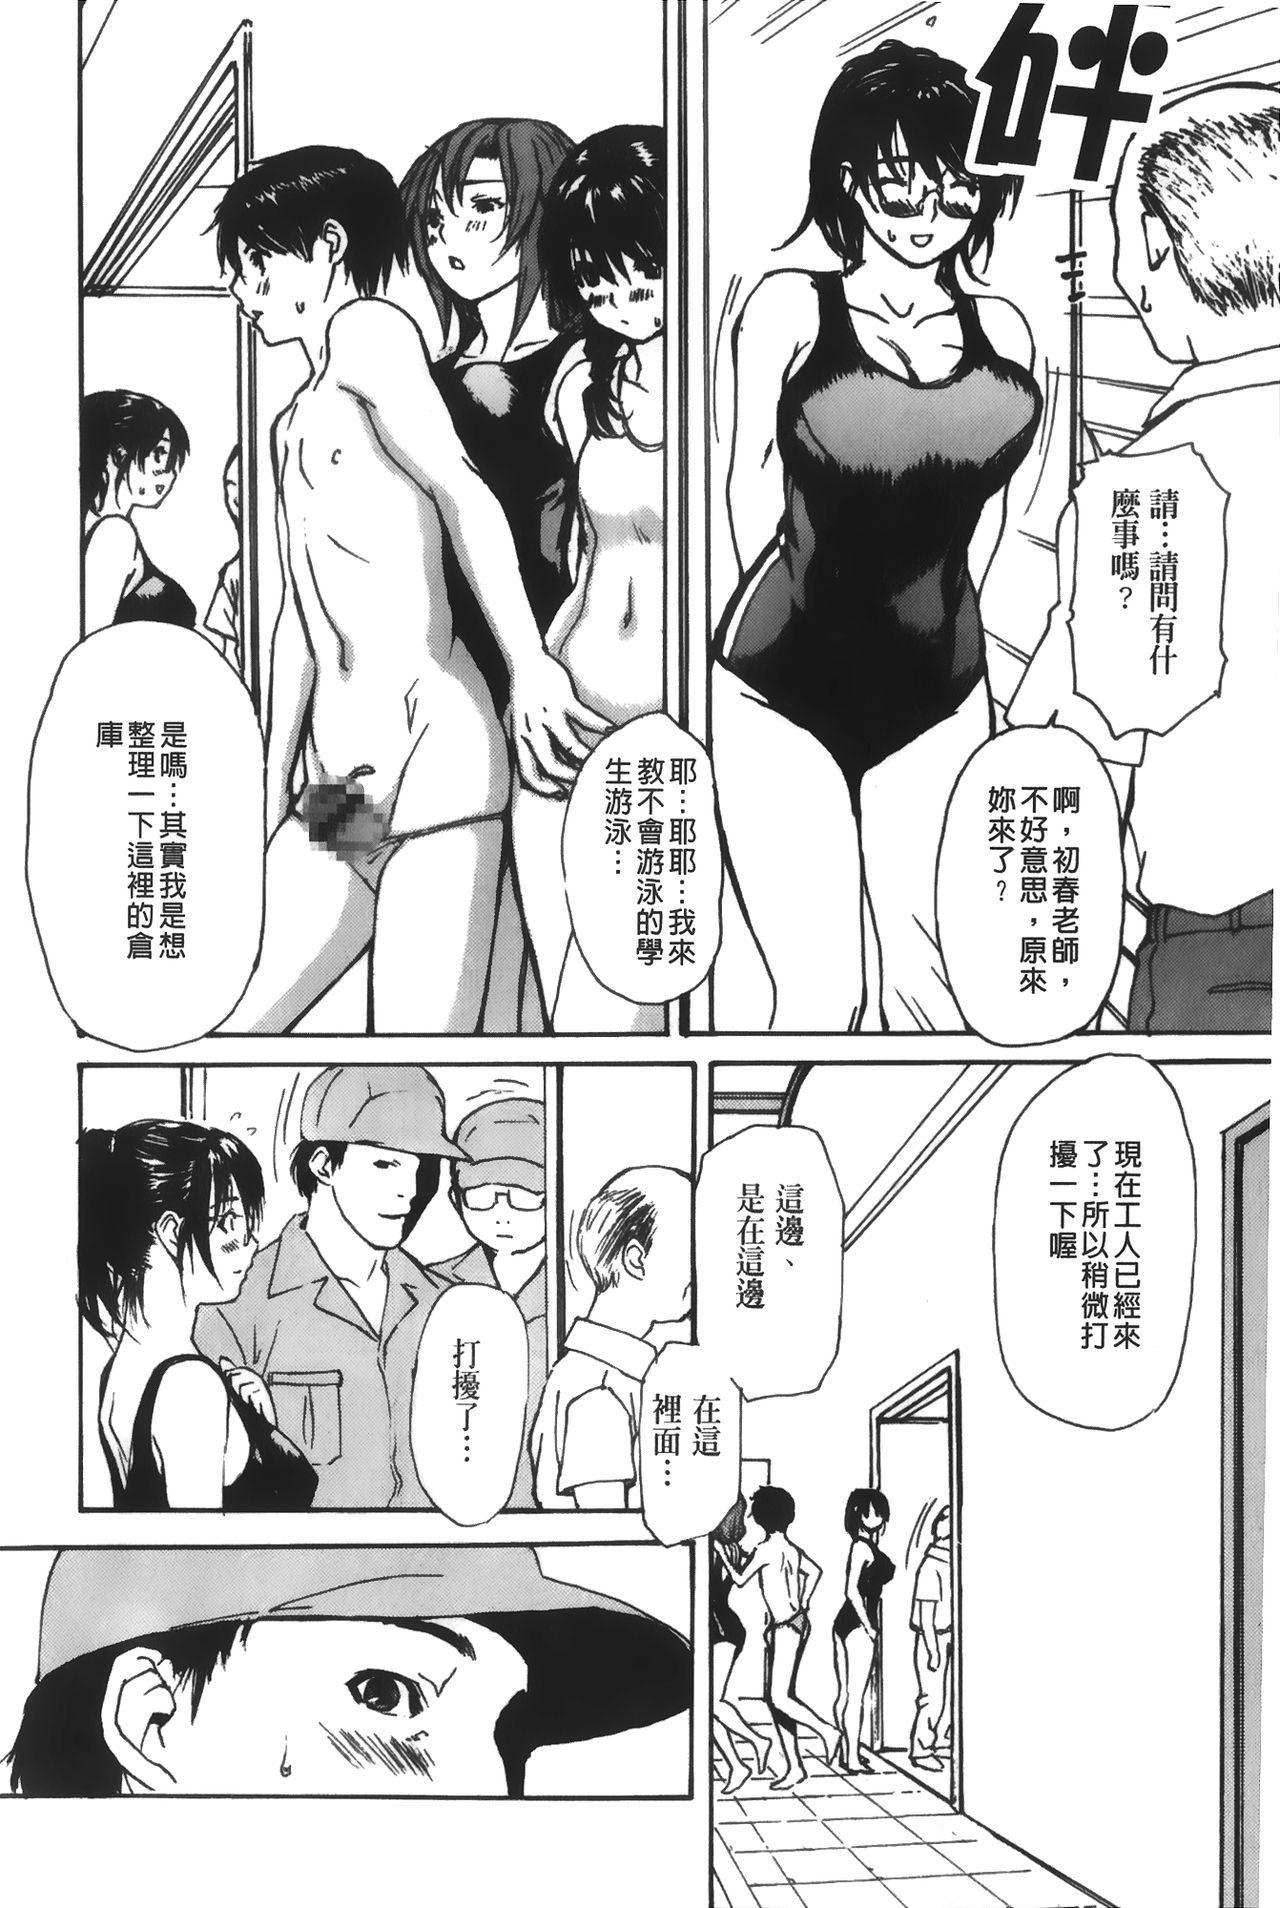 Tonari no Minano Sensei 4 | 隔壁的美奈乃老師 4 12